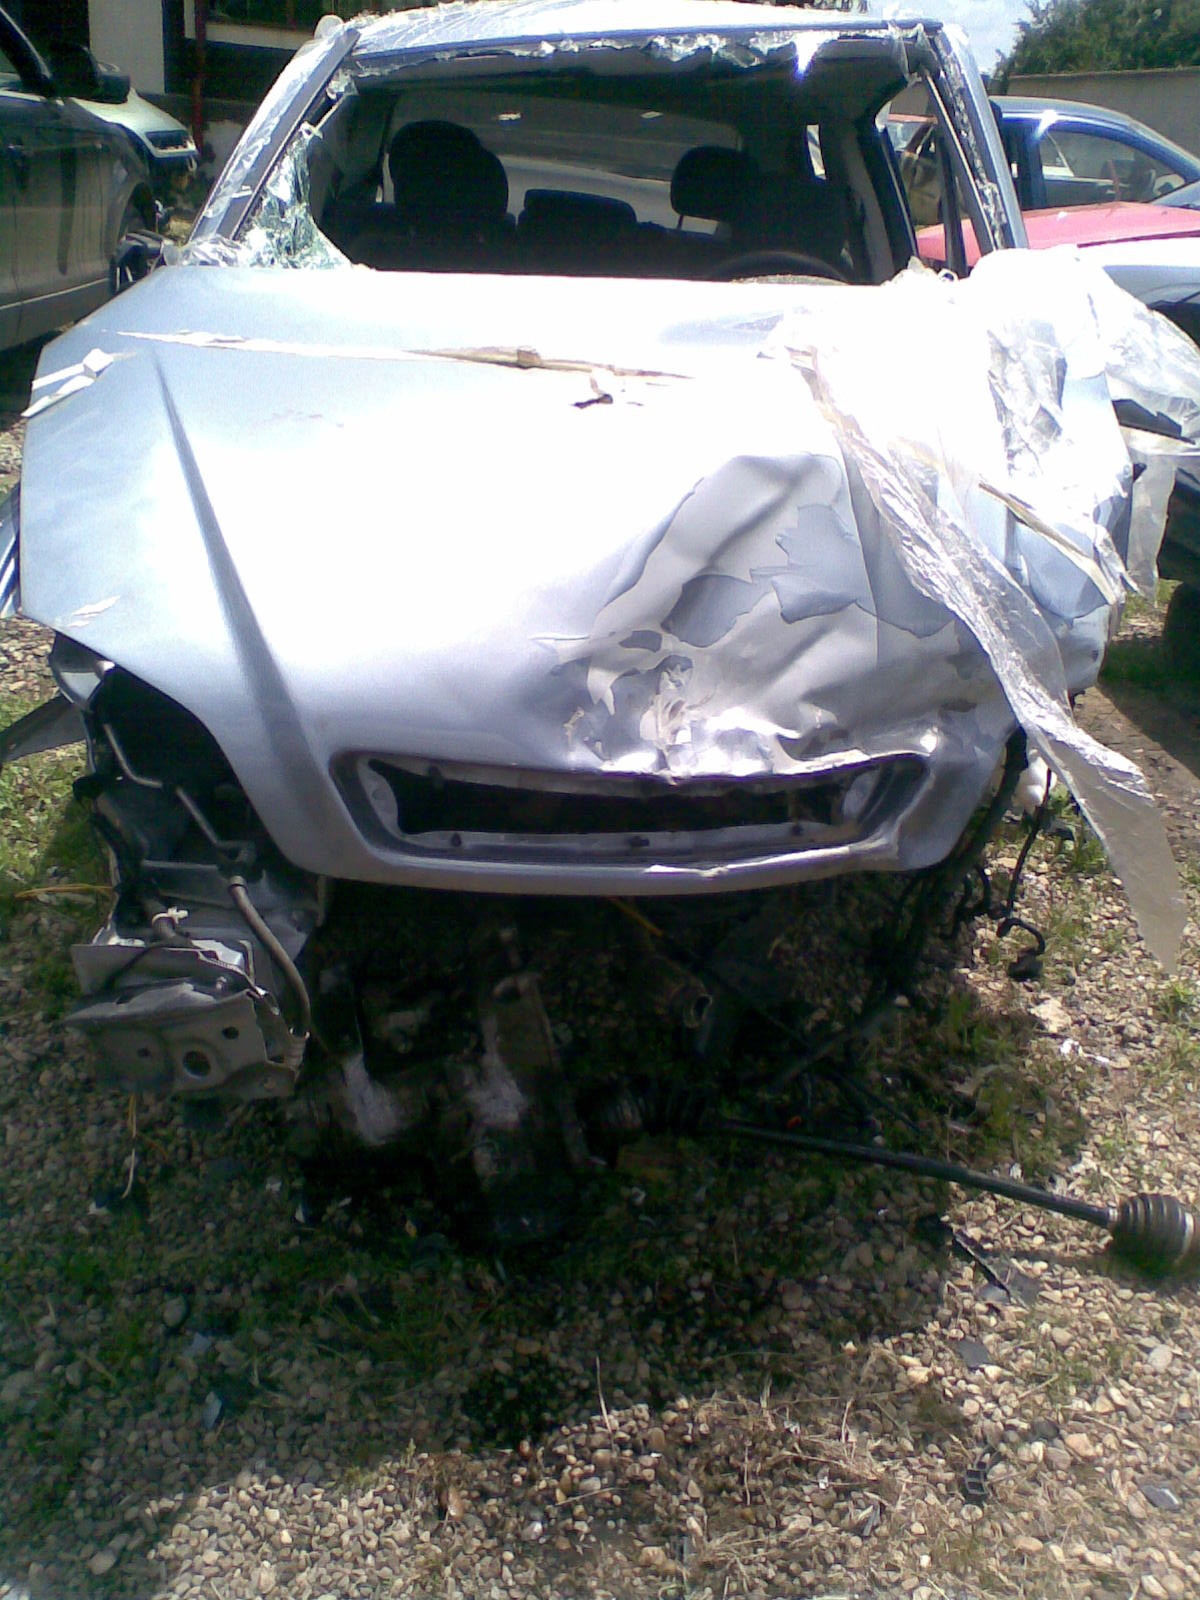 Opel Astra-G avariat 2006 Benzina Hatchback - 05 Iunie 2013 - Poza 1